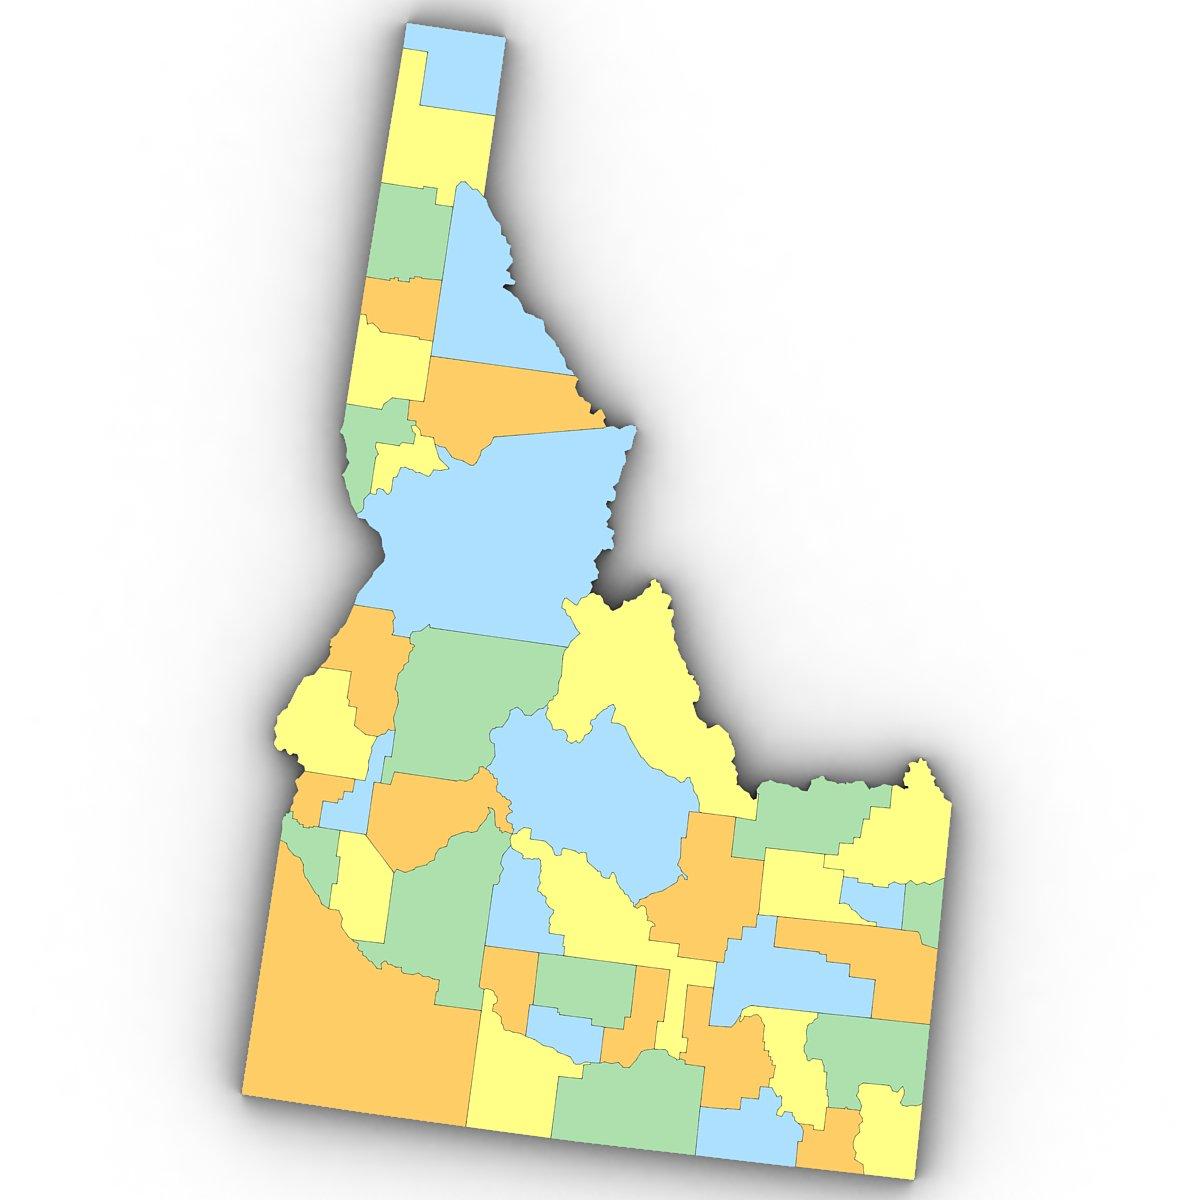 Idaho Political Map 3D Model in Environment 3DExport on idaho landform map, northern idaho map, idaho's border map, idaho county map, idaho weather map, idaho map 1910, elk city idaho area map, idaho flag, nm geography map, idaho state map printable, idaho time zone, idaho politics, idaho legal map, idaho climate map, earth relief map, idaho historical map, idaho highway map, idaho outline, idaho resource map, idaho funny map,